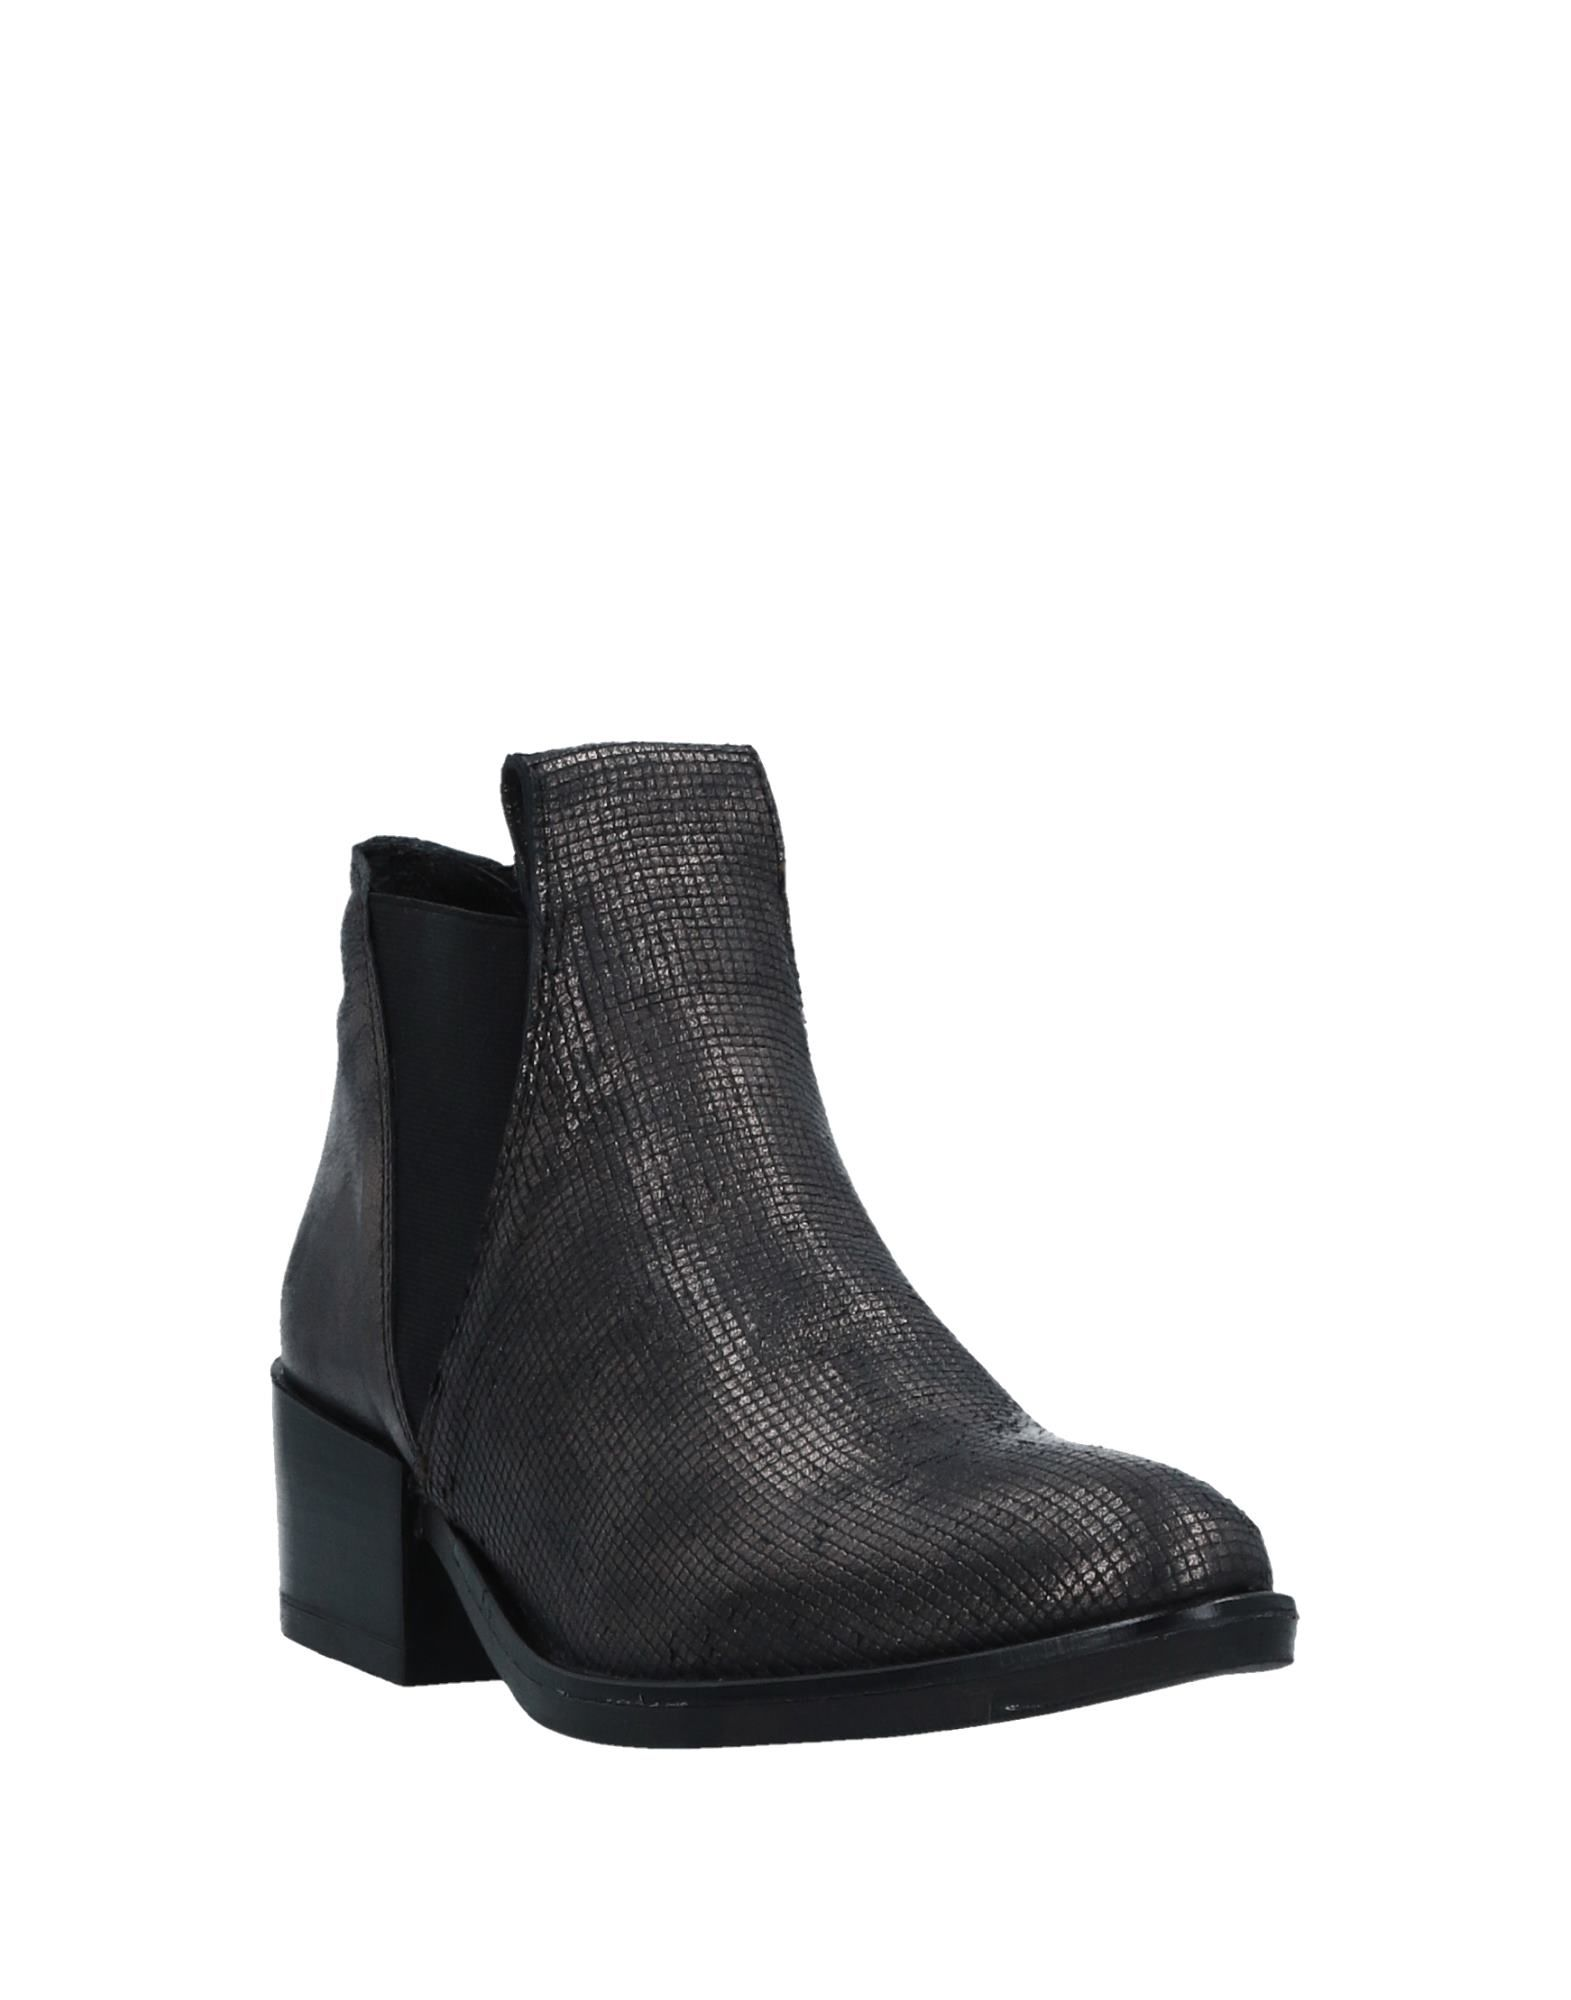 Stilvolle billige Schuhe Damen Violette Chelsea Stiefel Damen Schuhe  11524201ED 6861e3